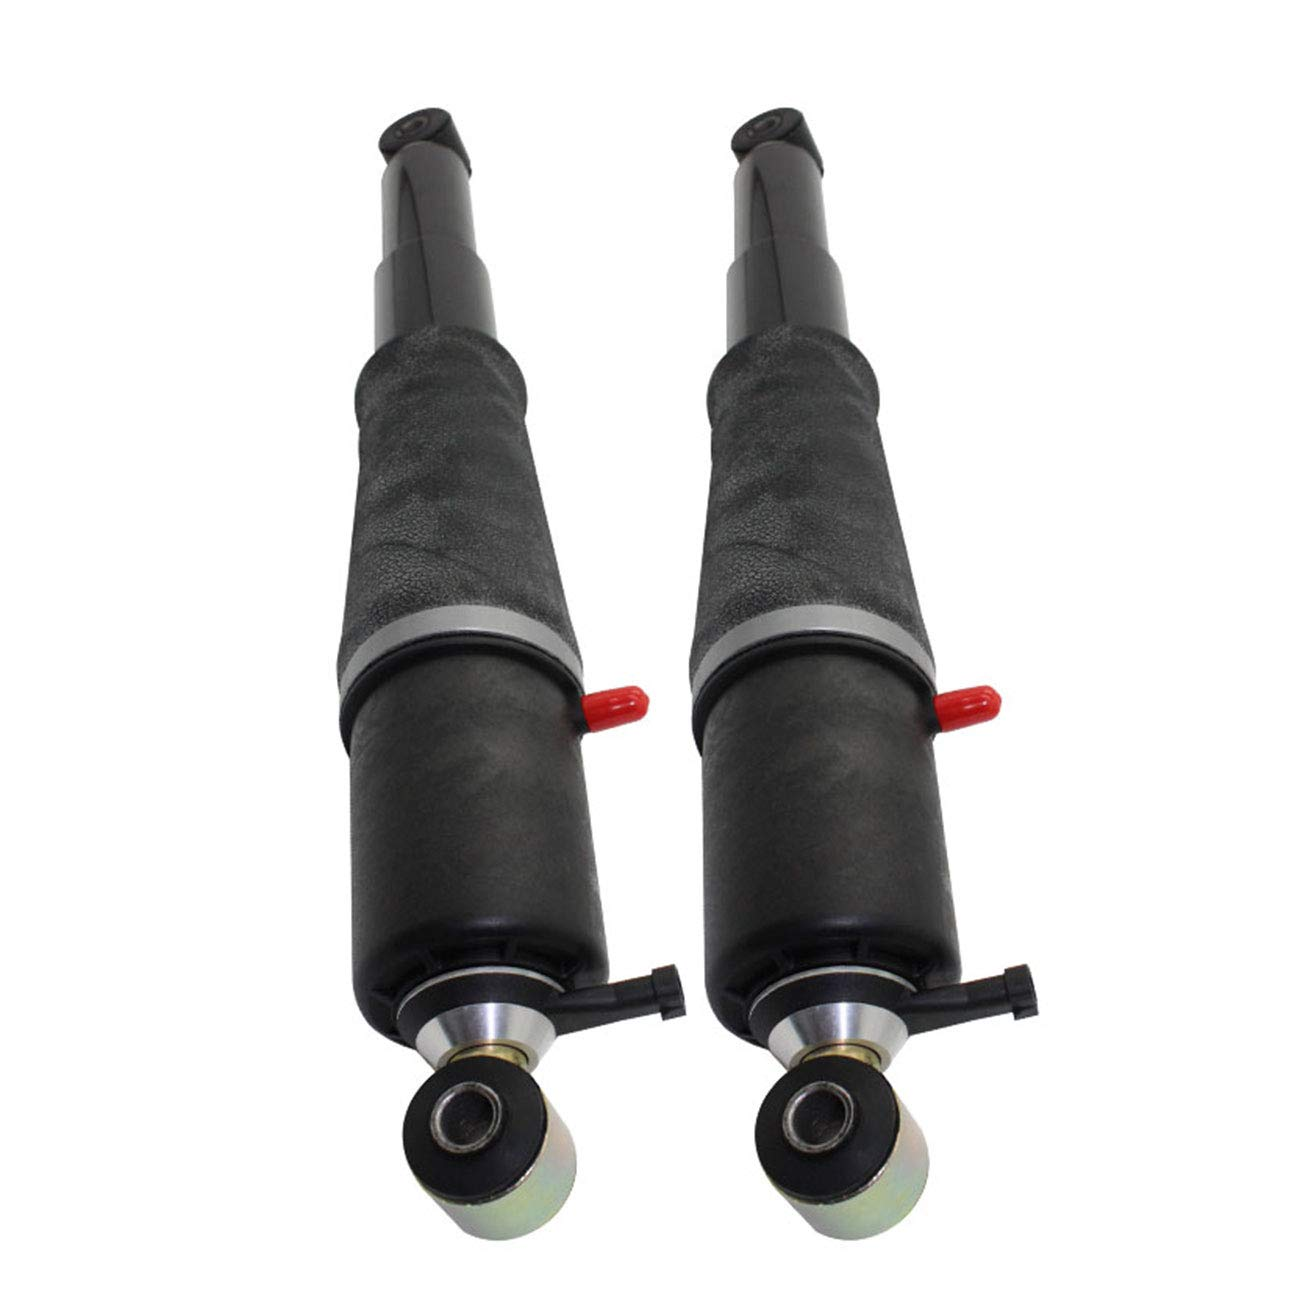 Maxiii Air Ride Suspension Shocks Rear Pair Left /& Right Compatible for 00-14 CHEVROLET GMC CADILLAC ESCALADE